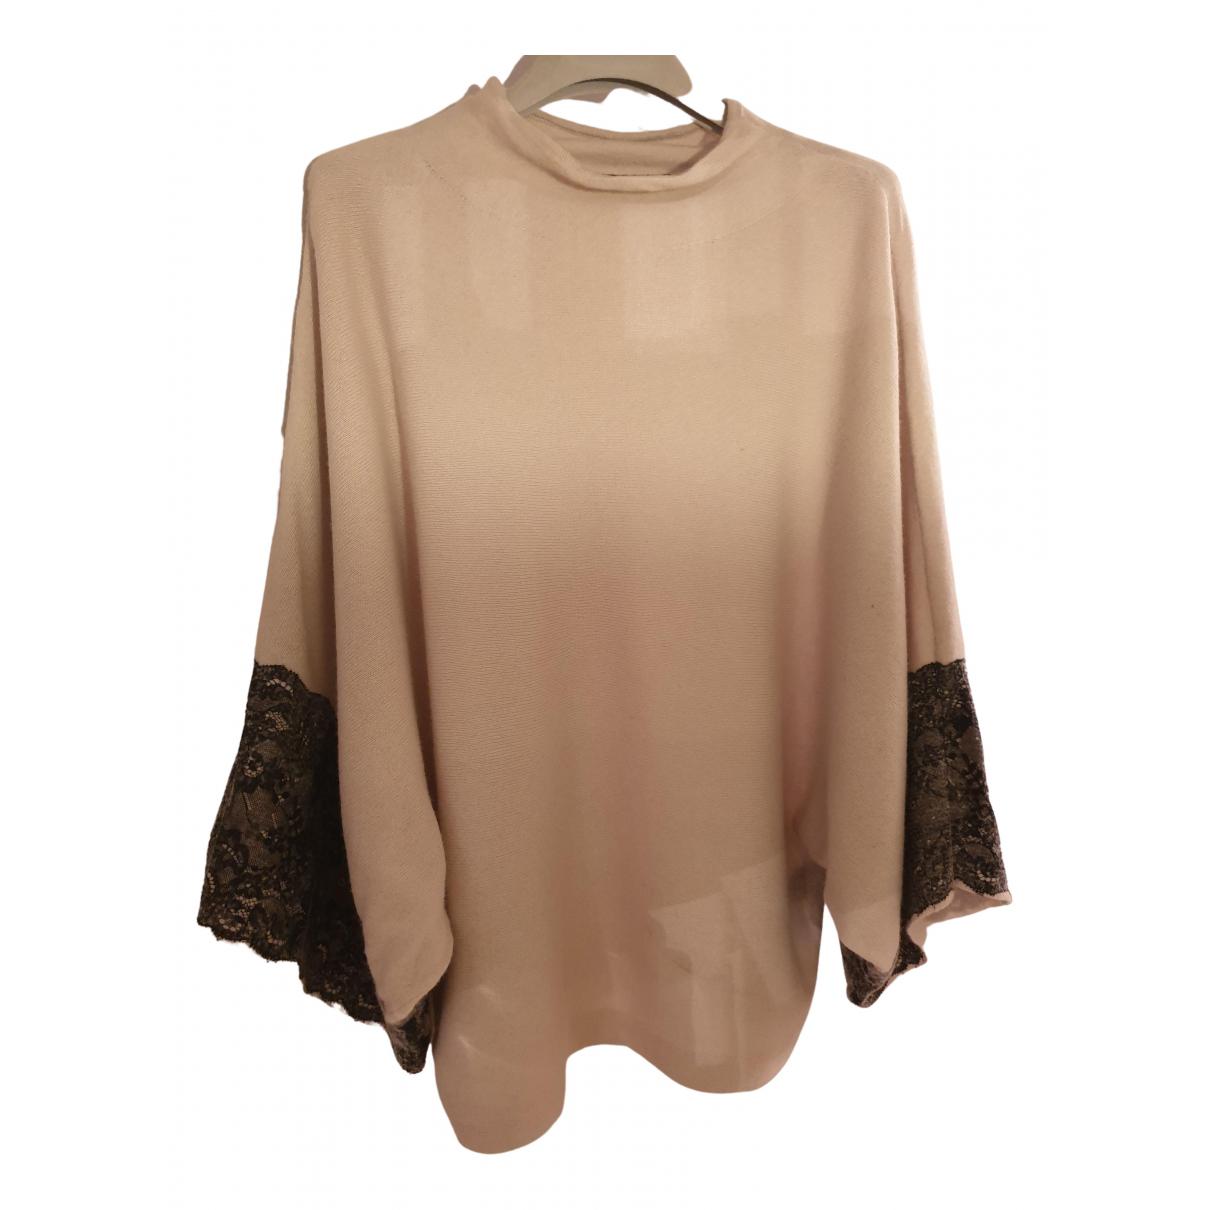 Karen Millen - Pull   pour femme en laine - beige